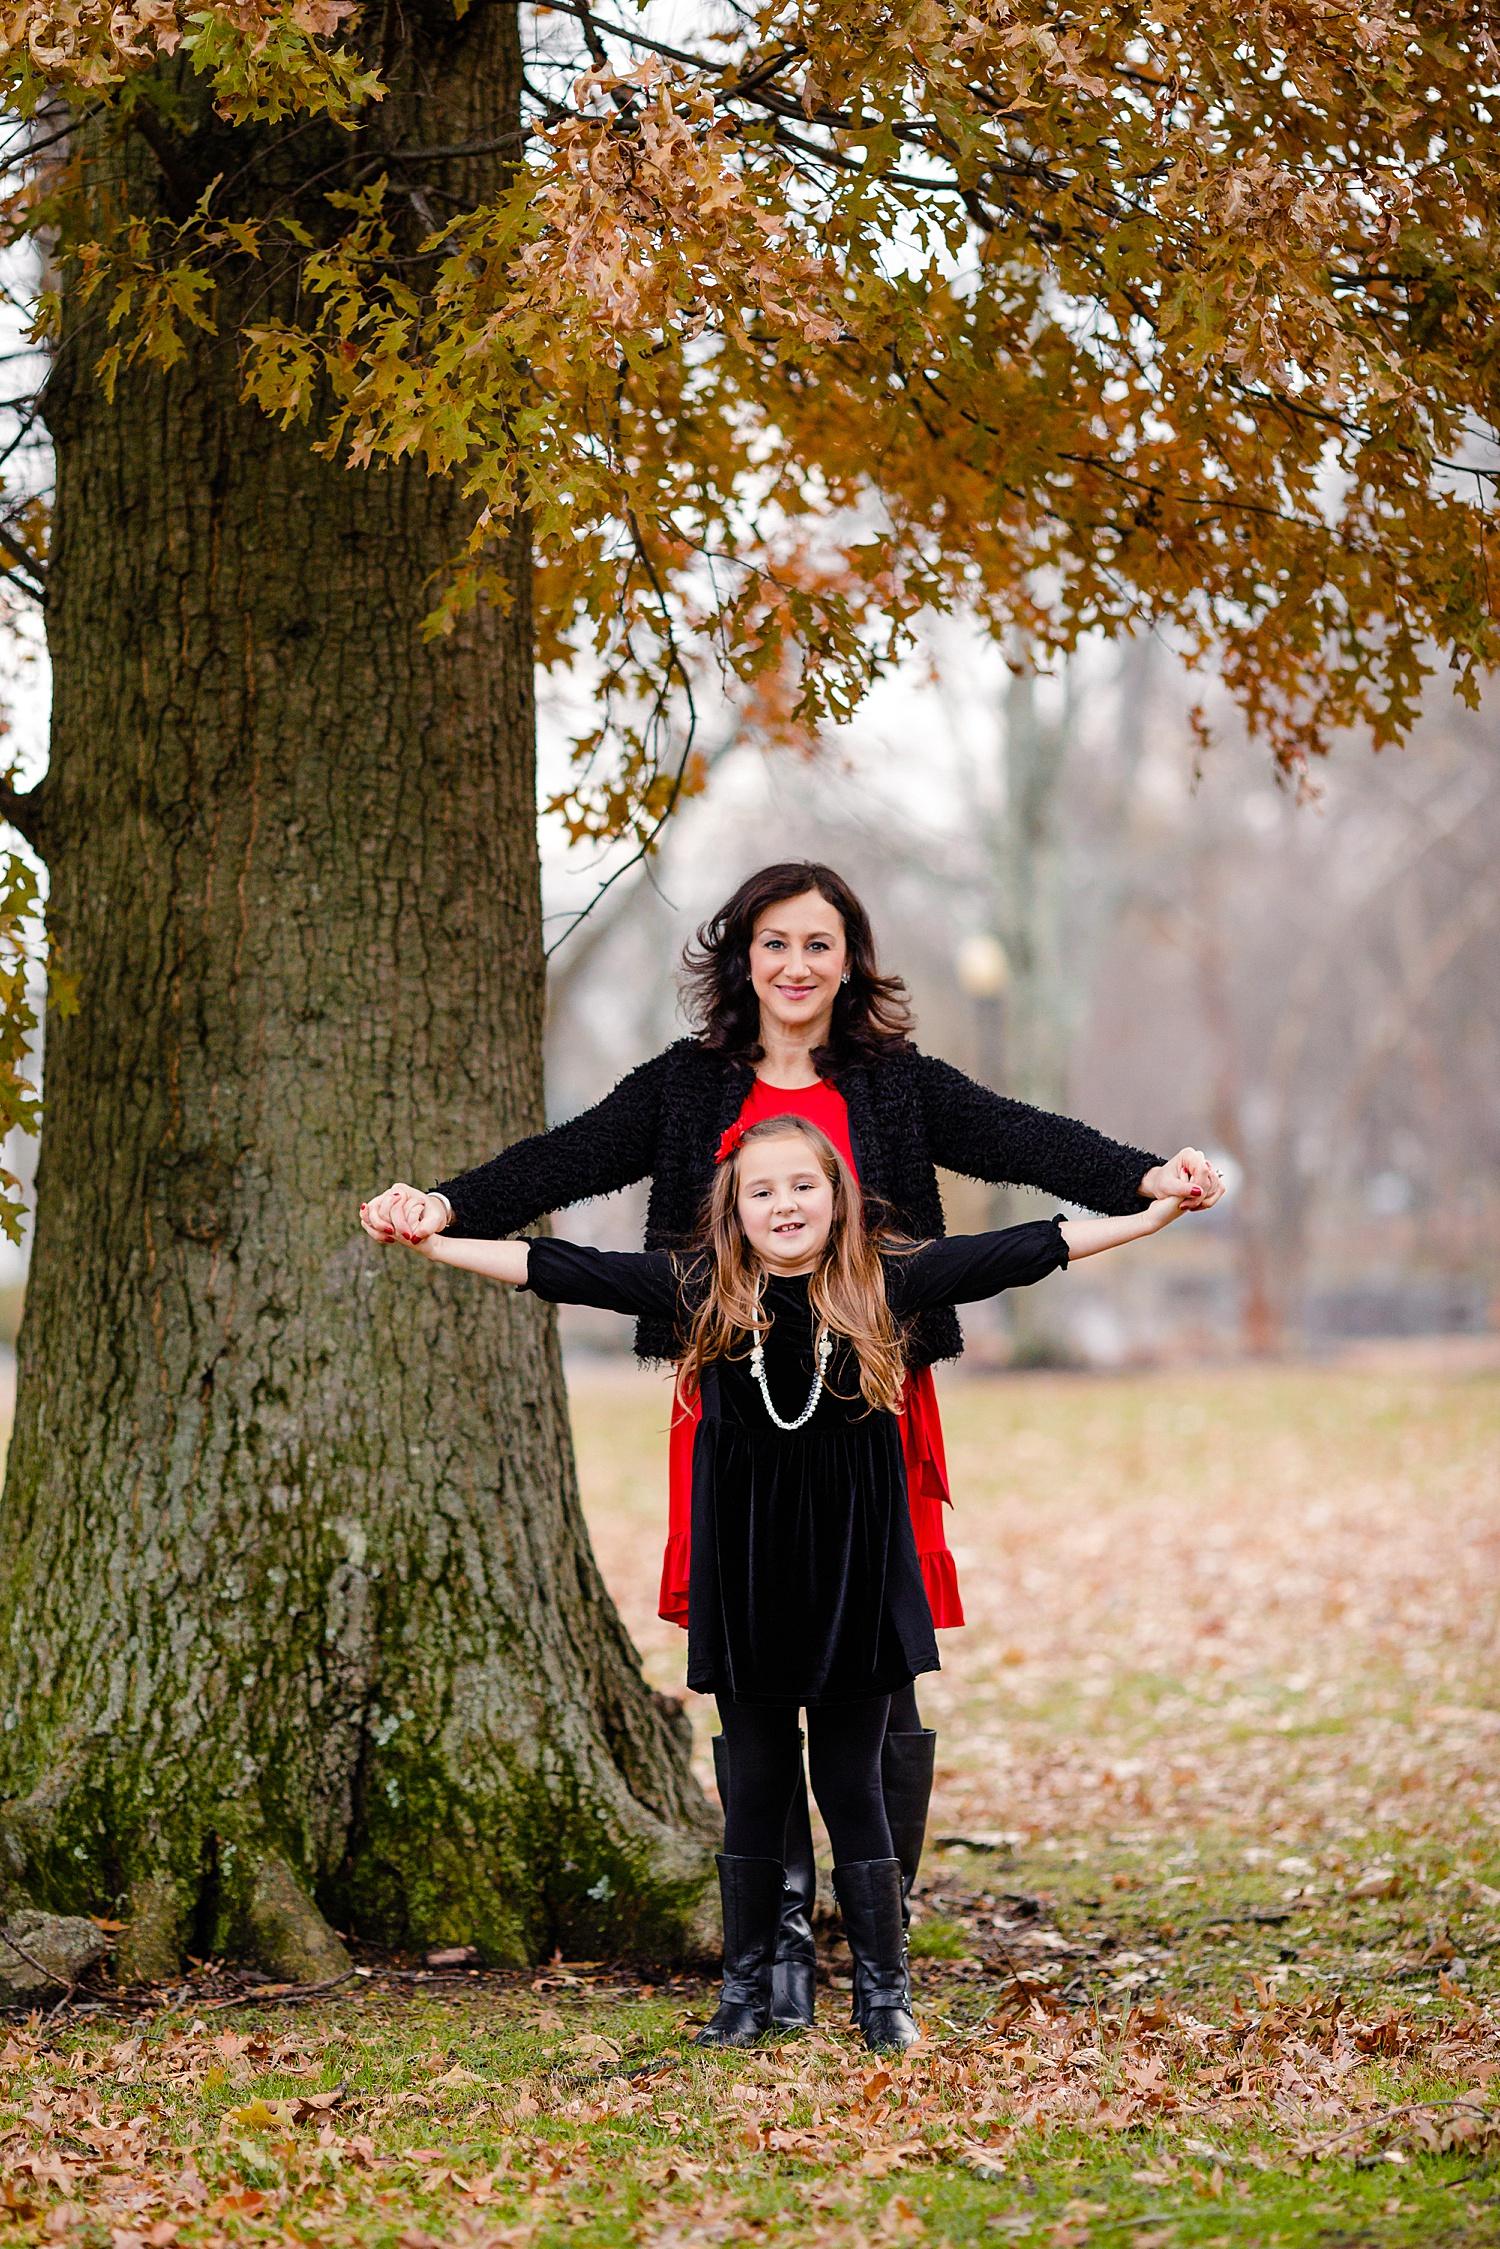 Mindowaskin Park Westfield New Jersey family portrait photoshoot photographer